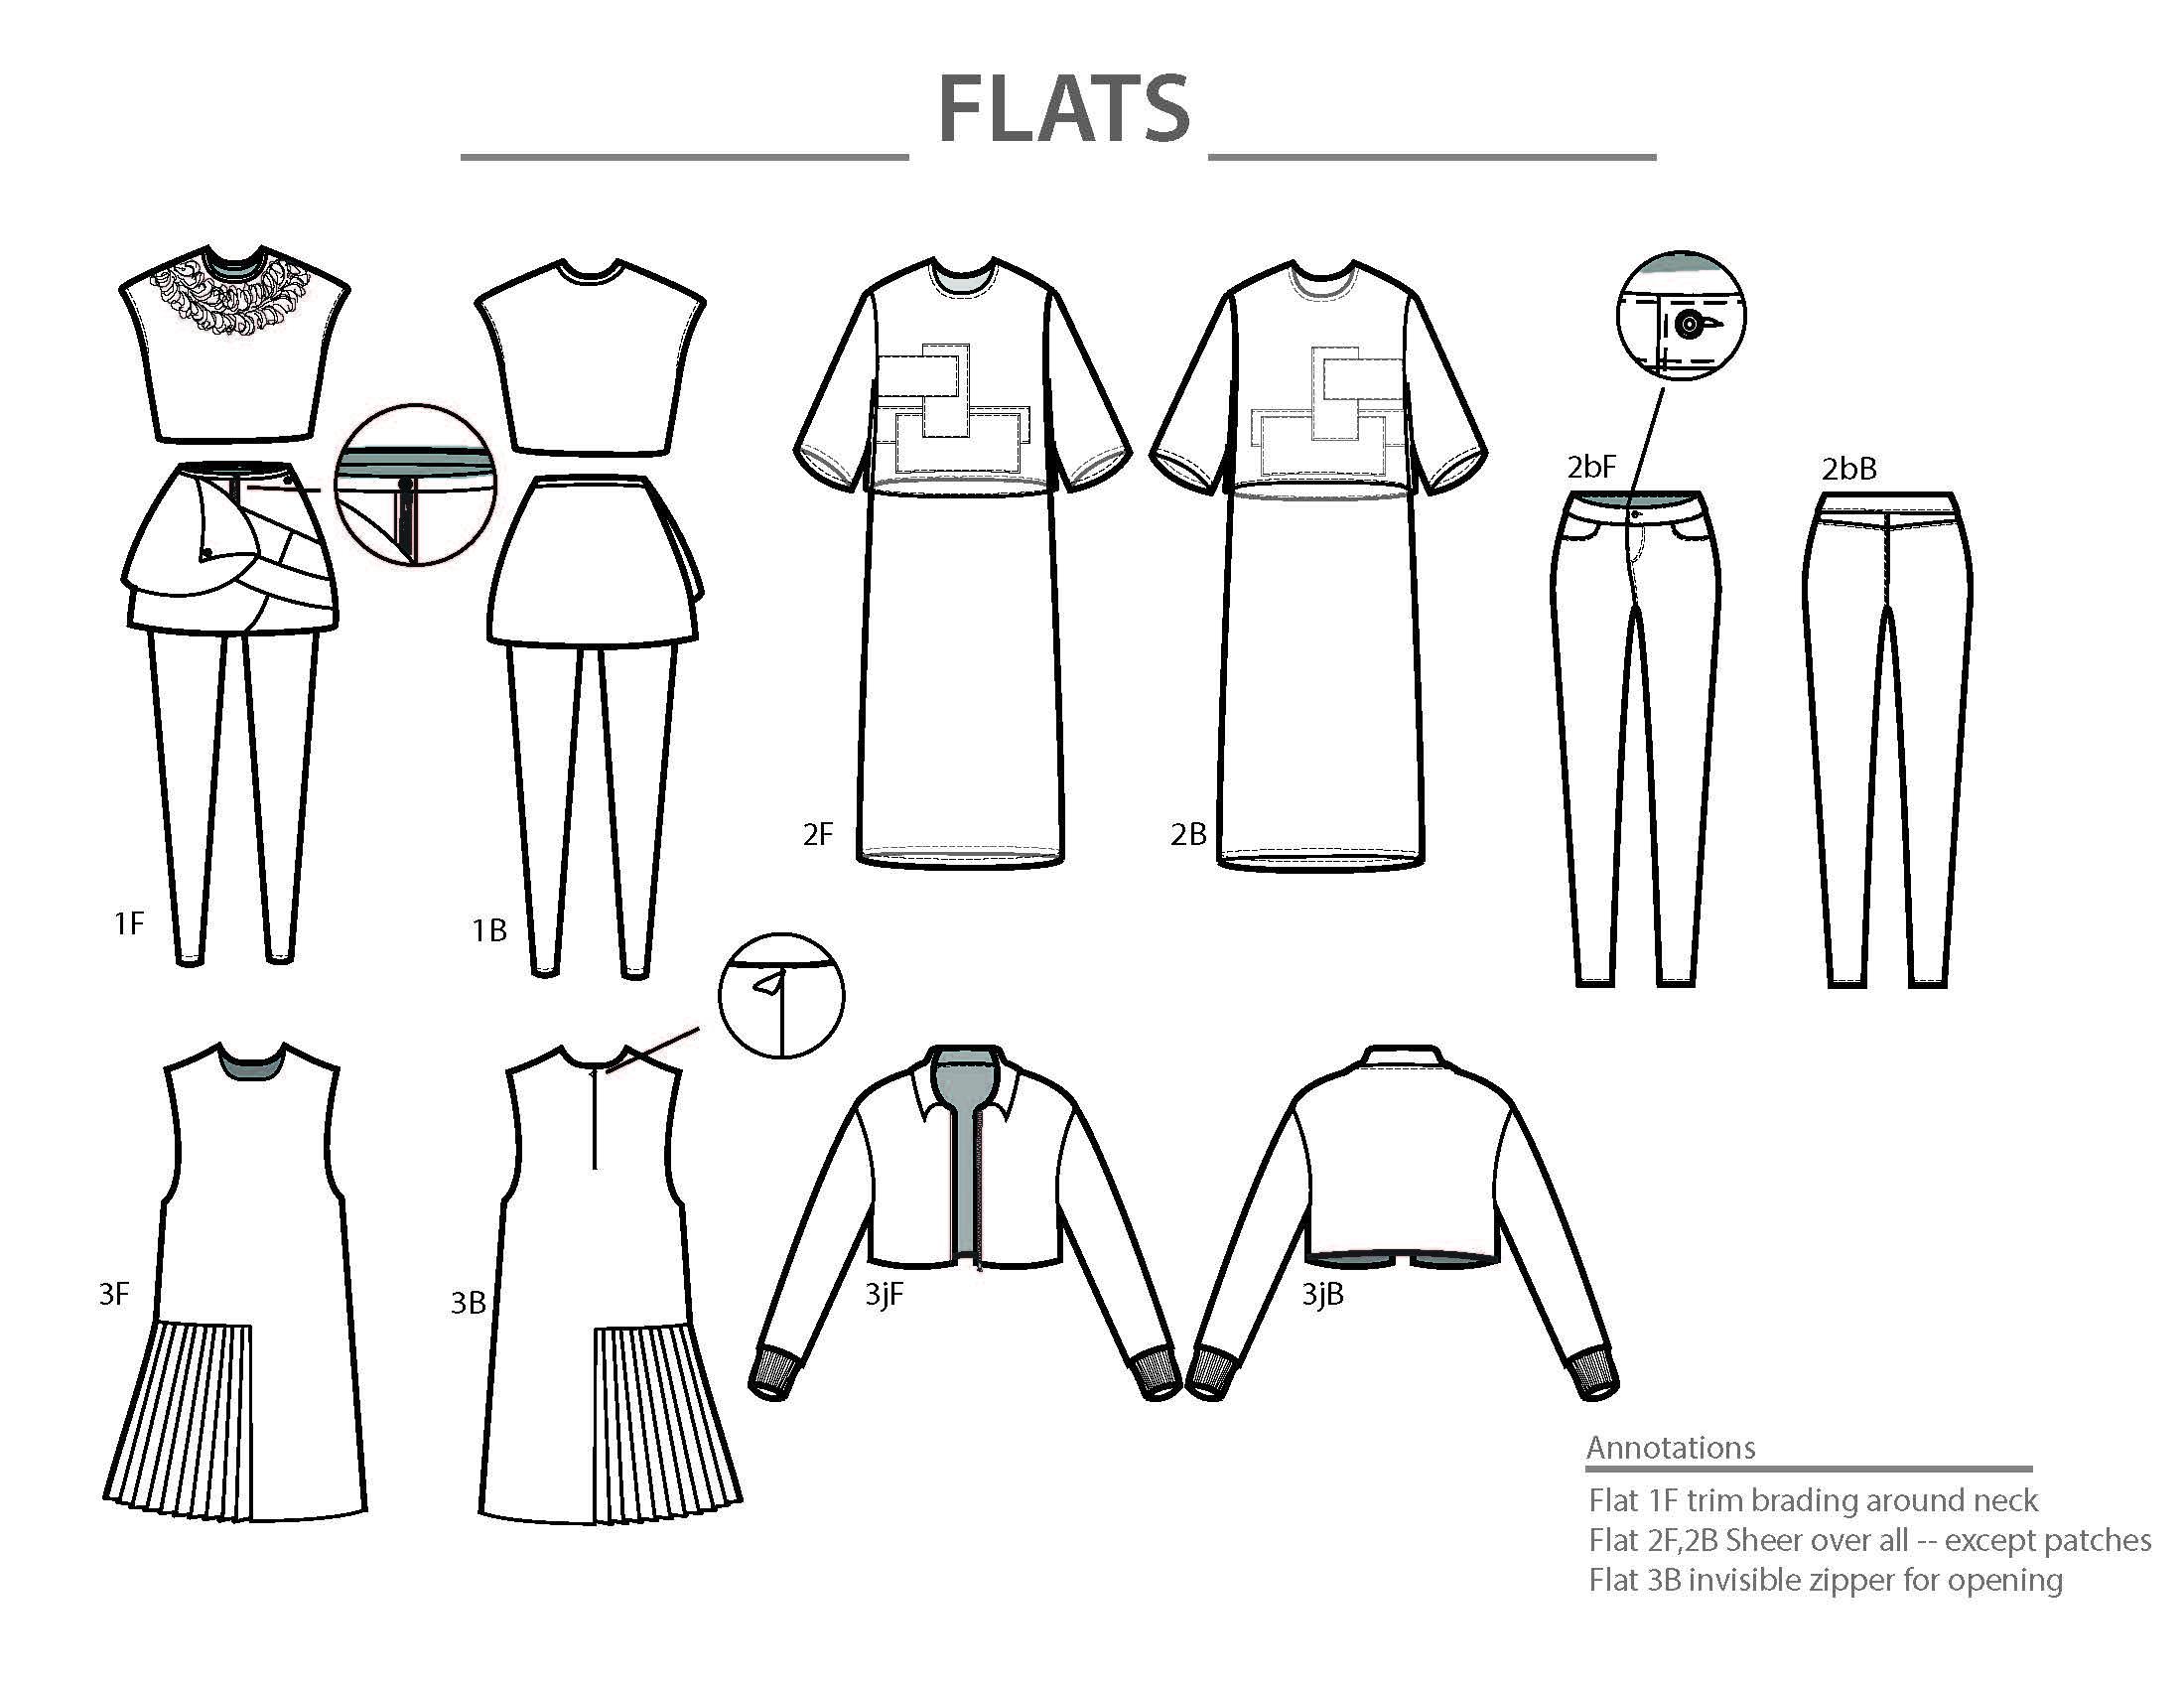 zkx.assignment2.C1.flats copy